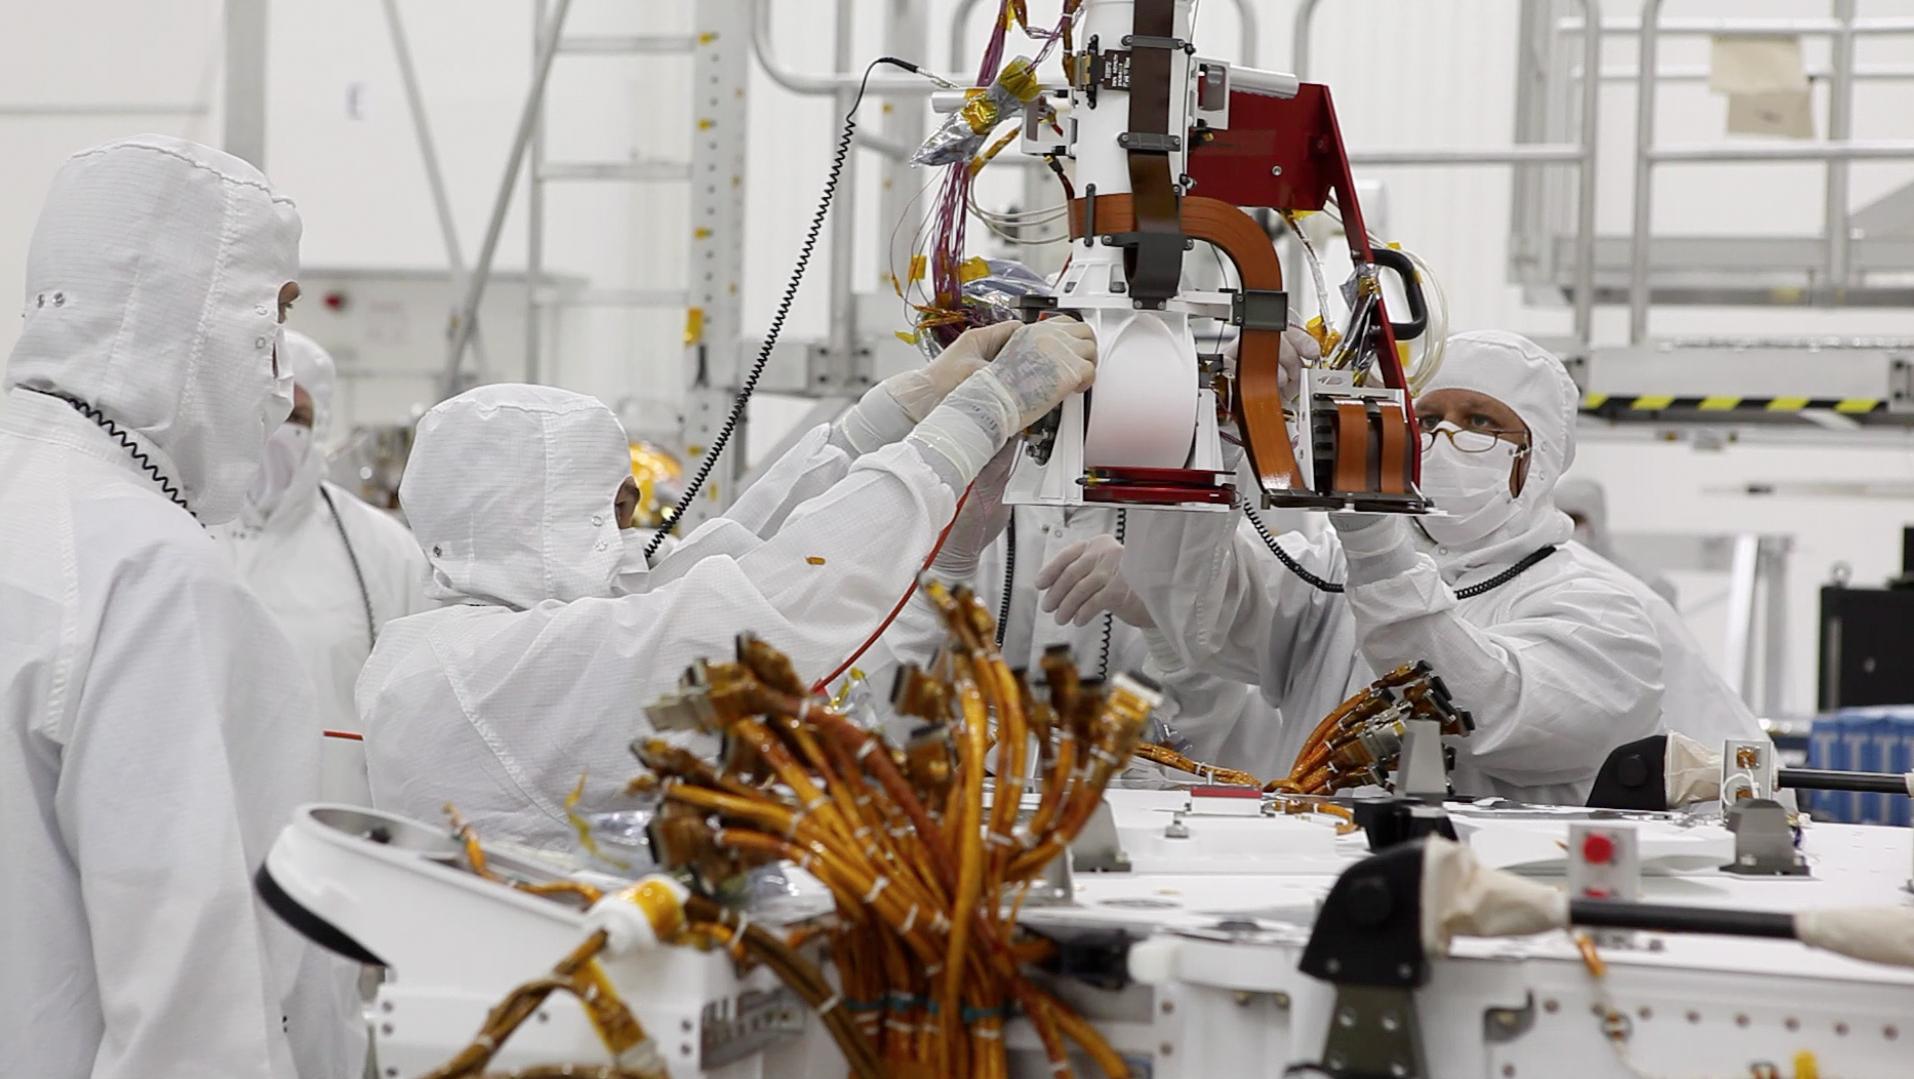 space engineers mars rover - photo #34